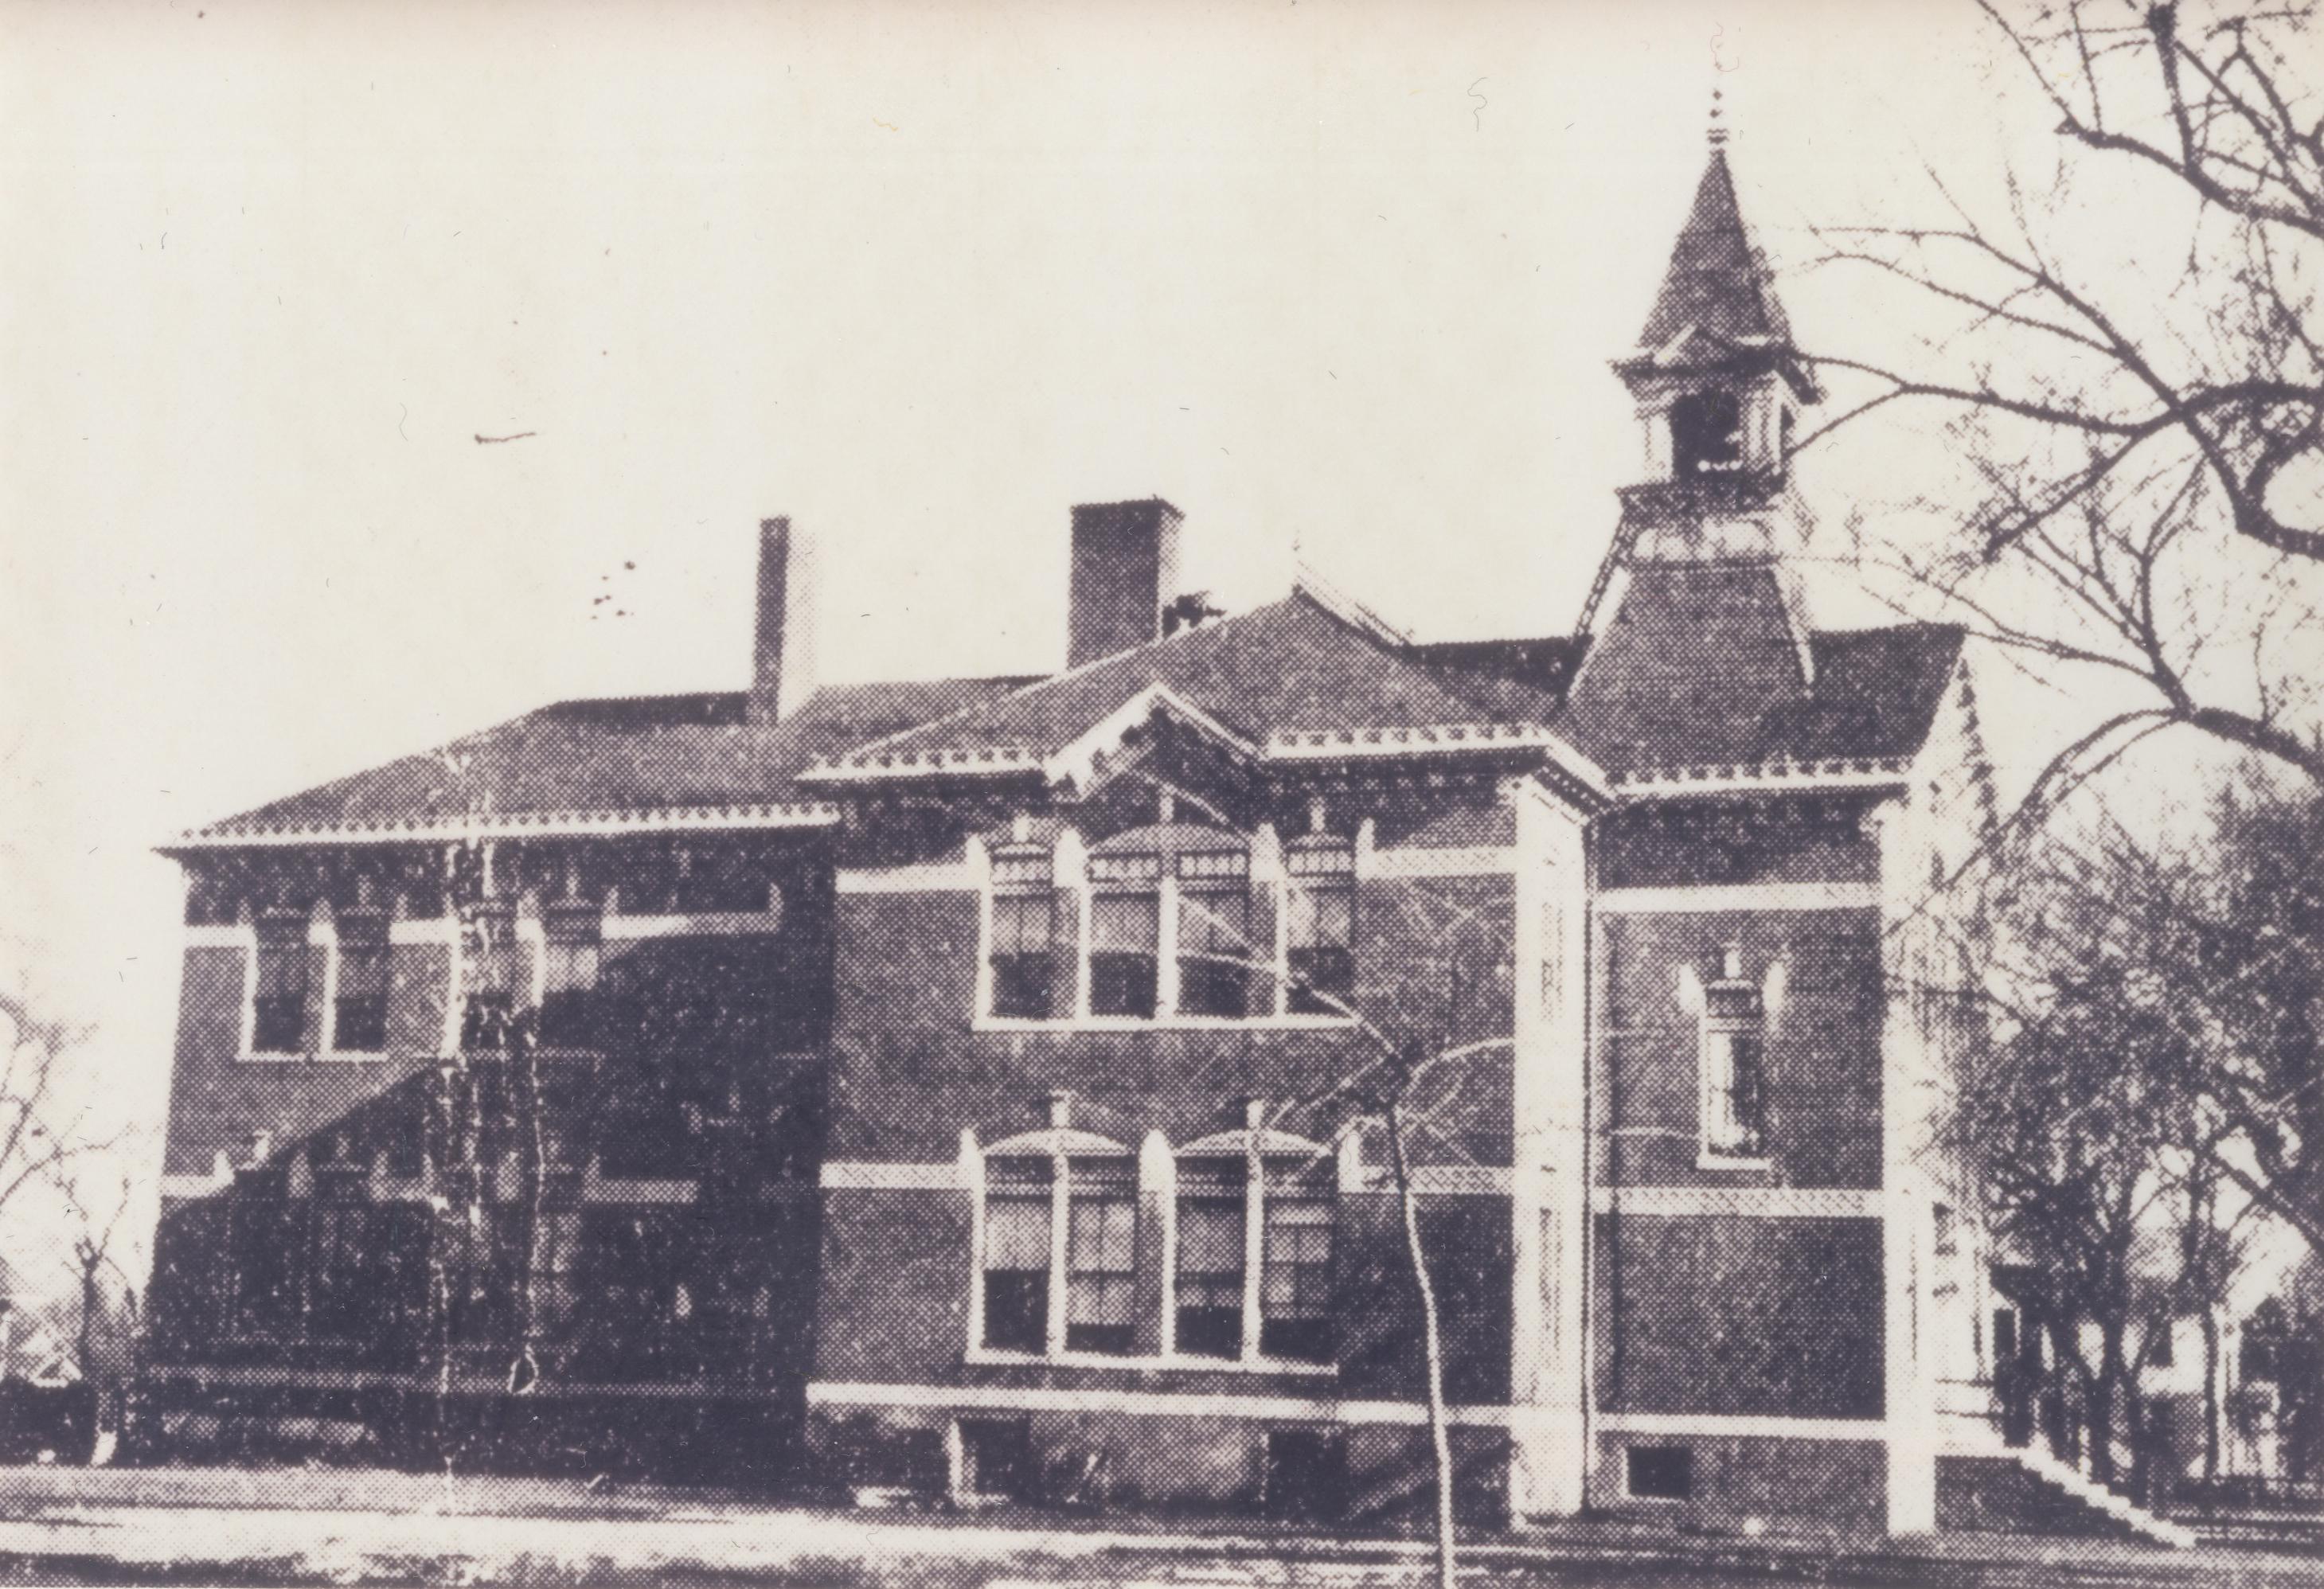 Second Ward/Williams 1883-1898